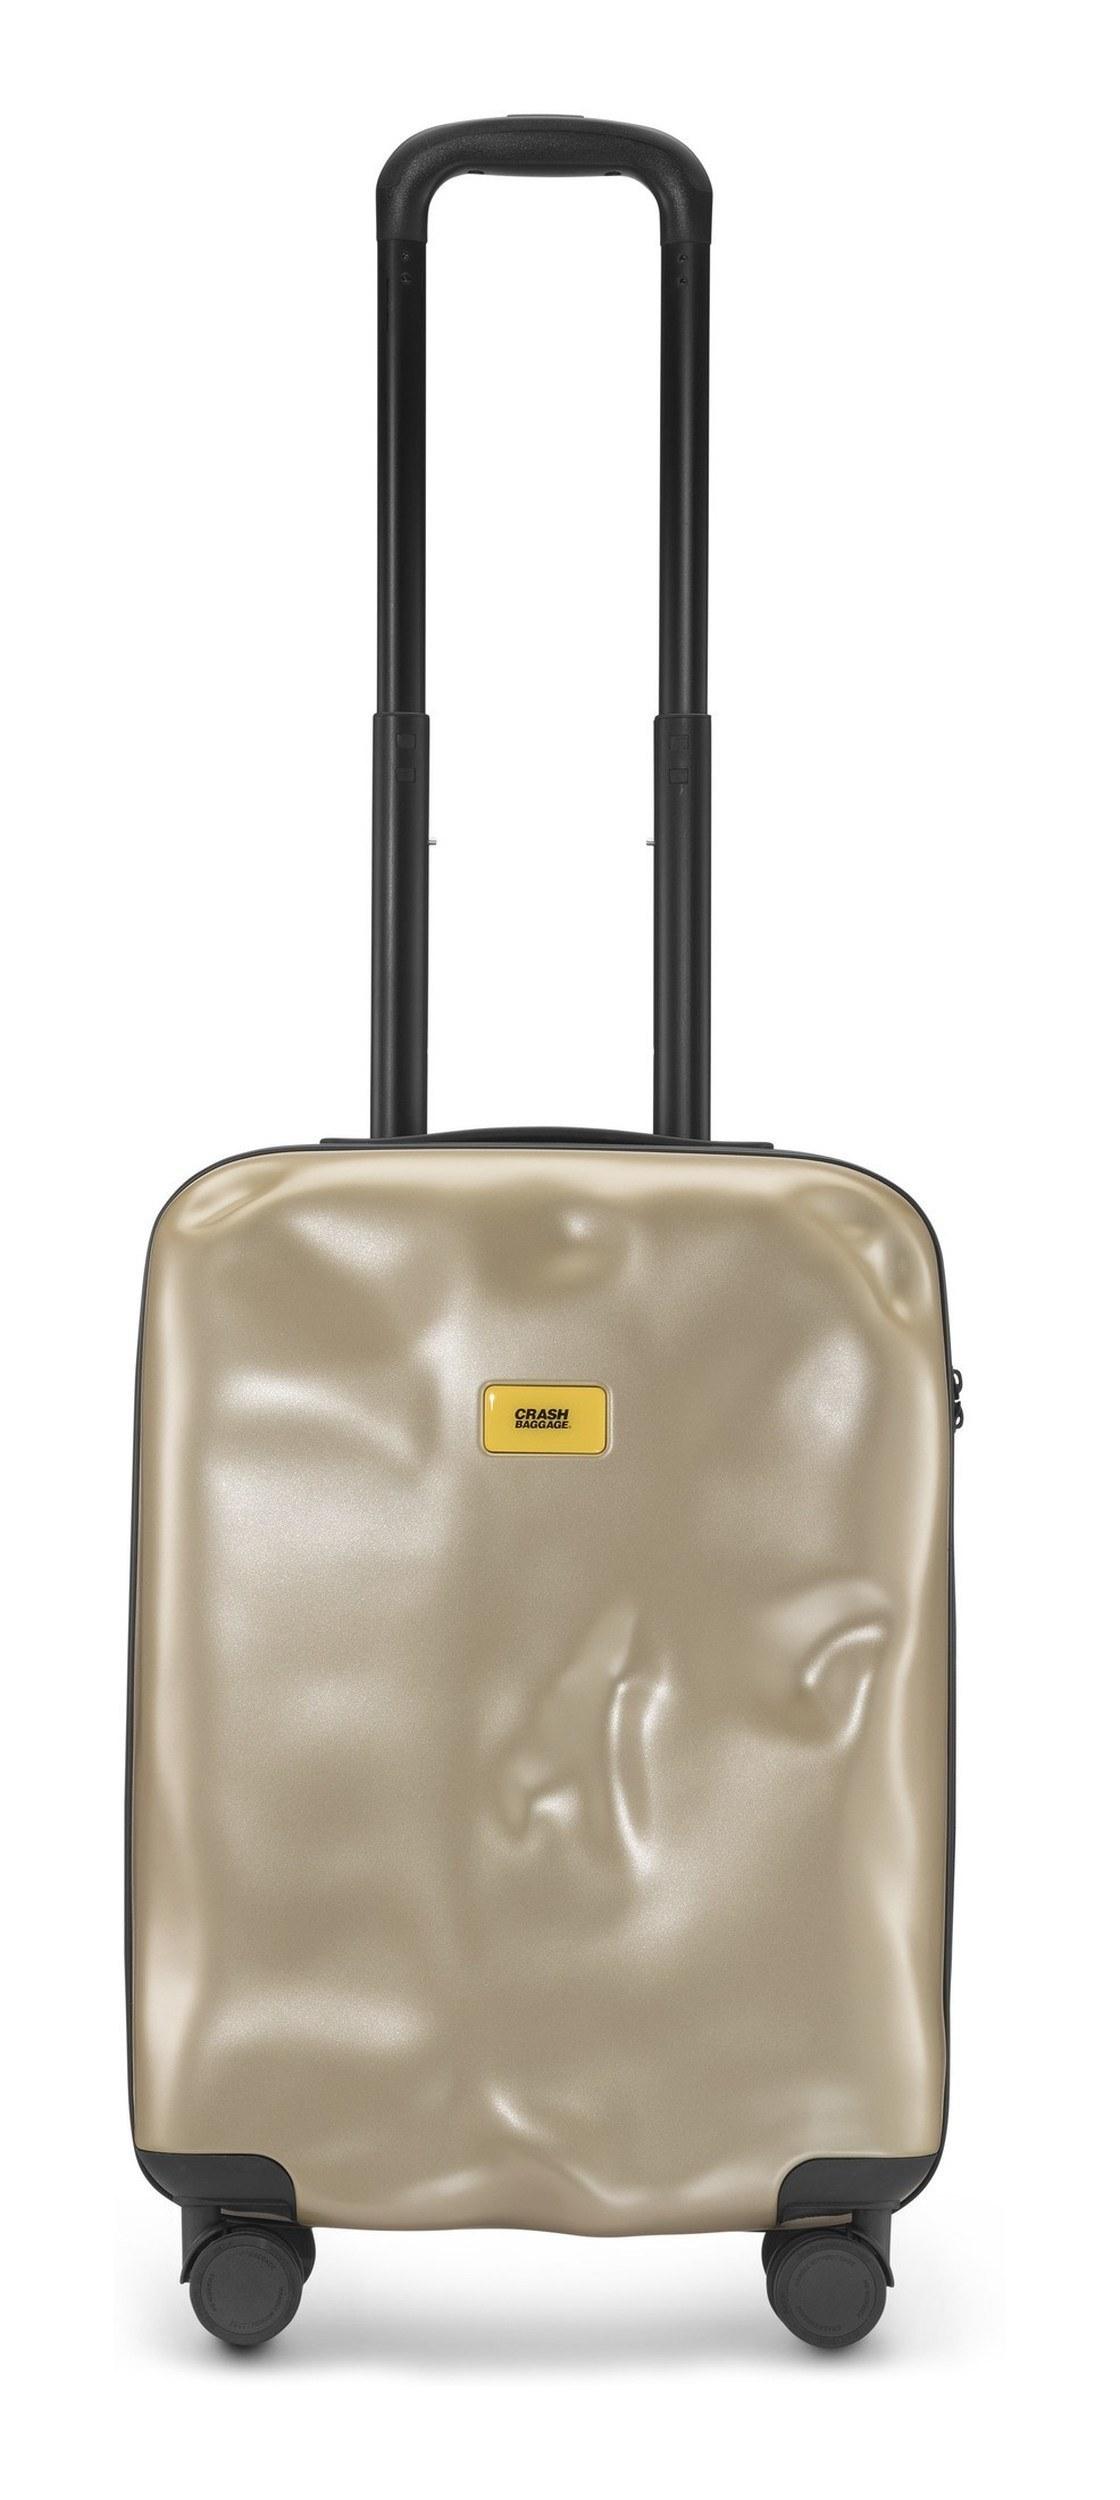 2e3bb55d7abbc Walizka Icon kabinowa - Crash Baggage CB161.20, Francesco Pavia